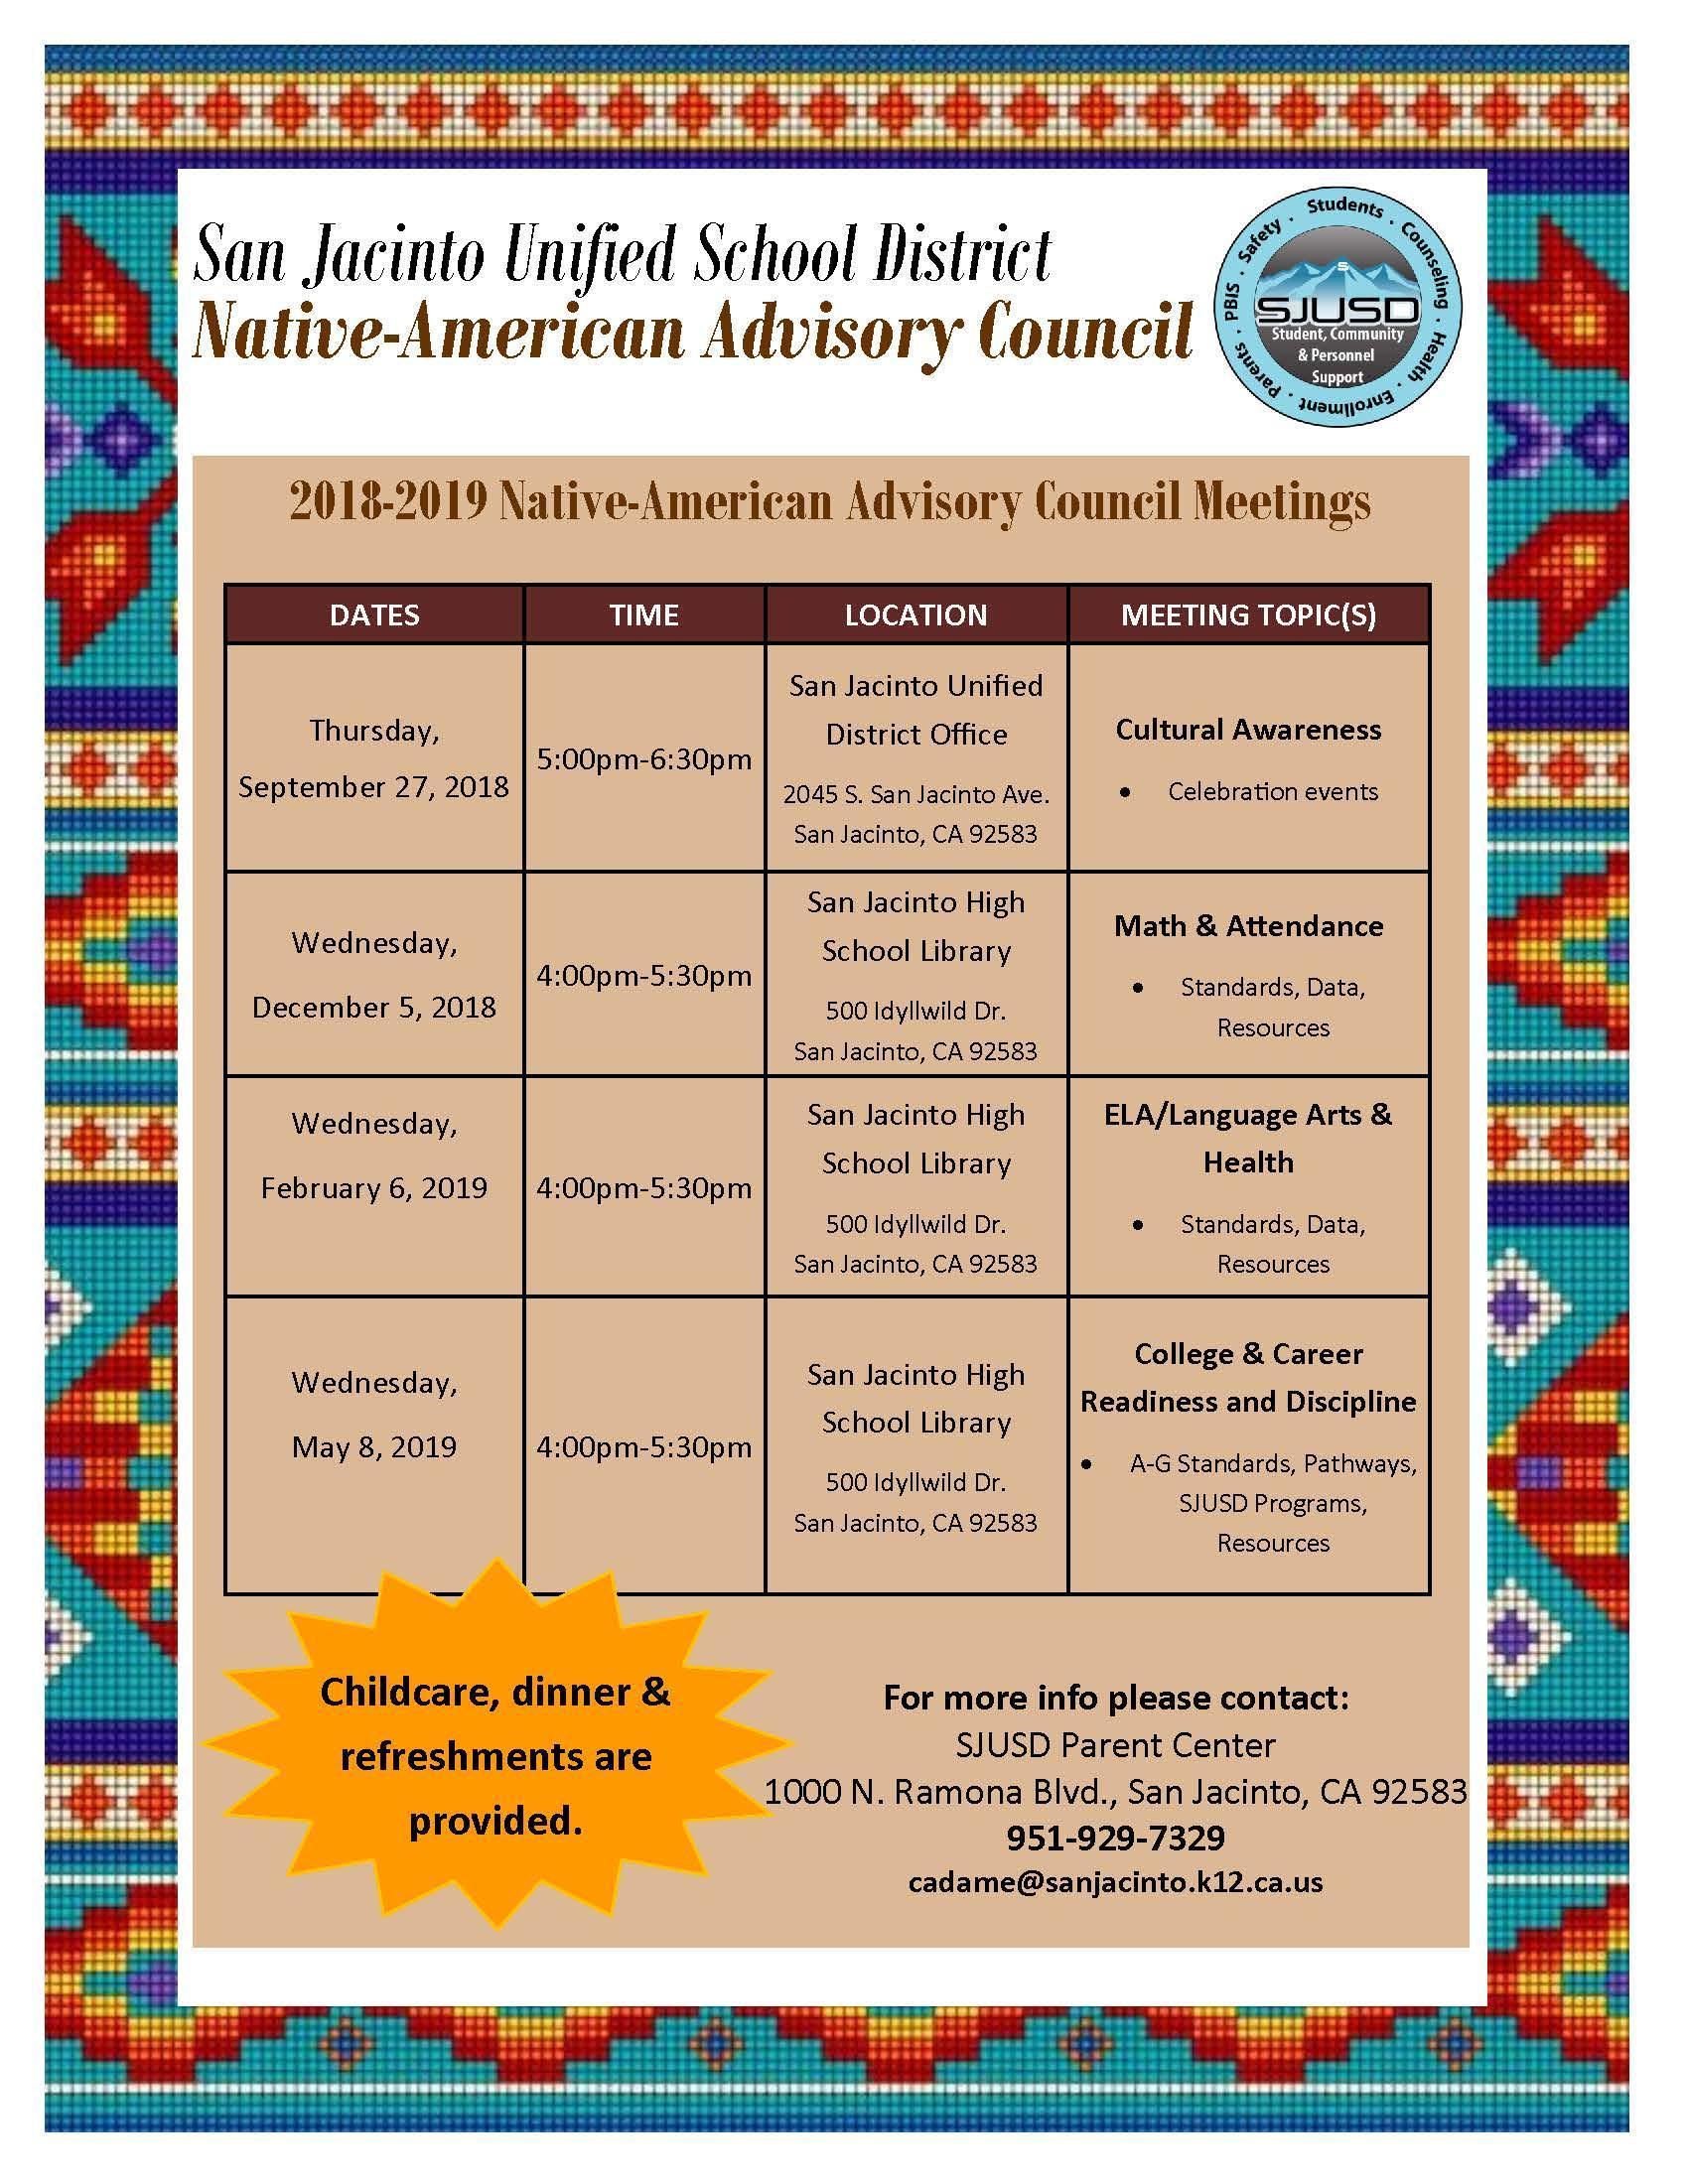 Native American Advisory Council Dates 2018